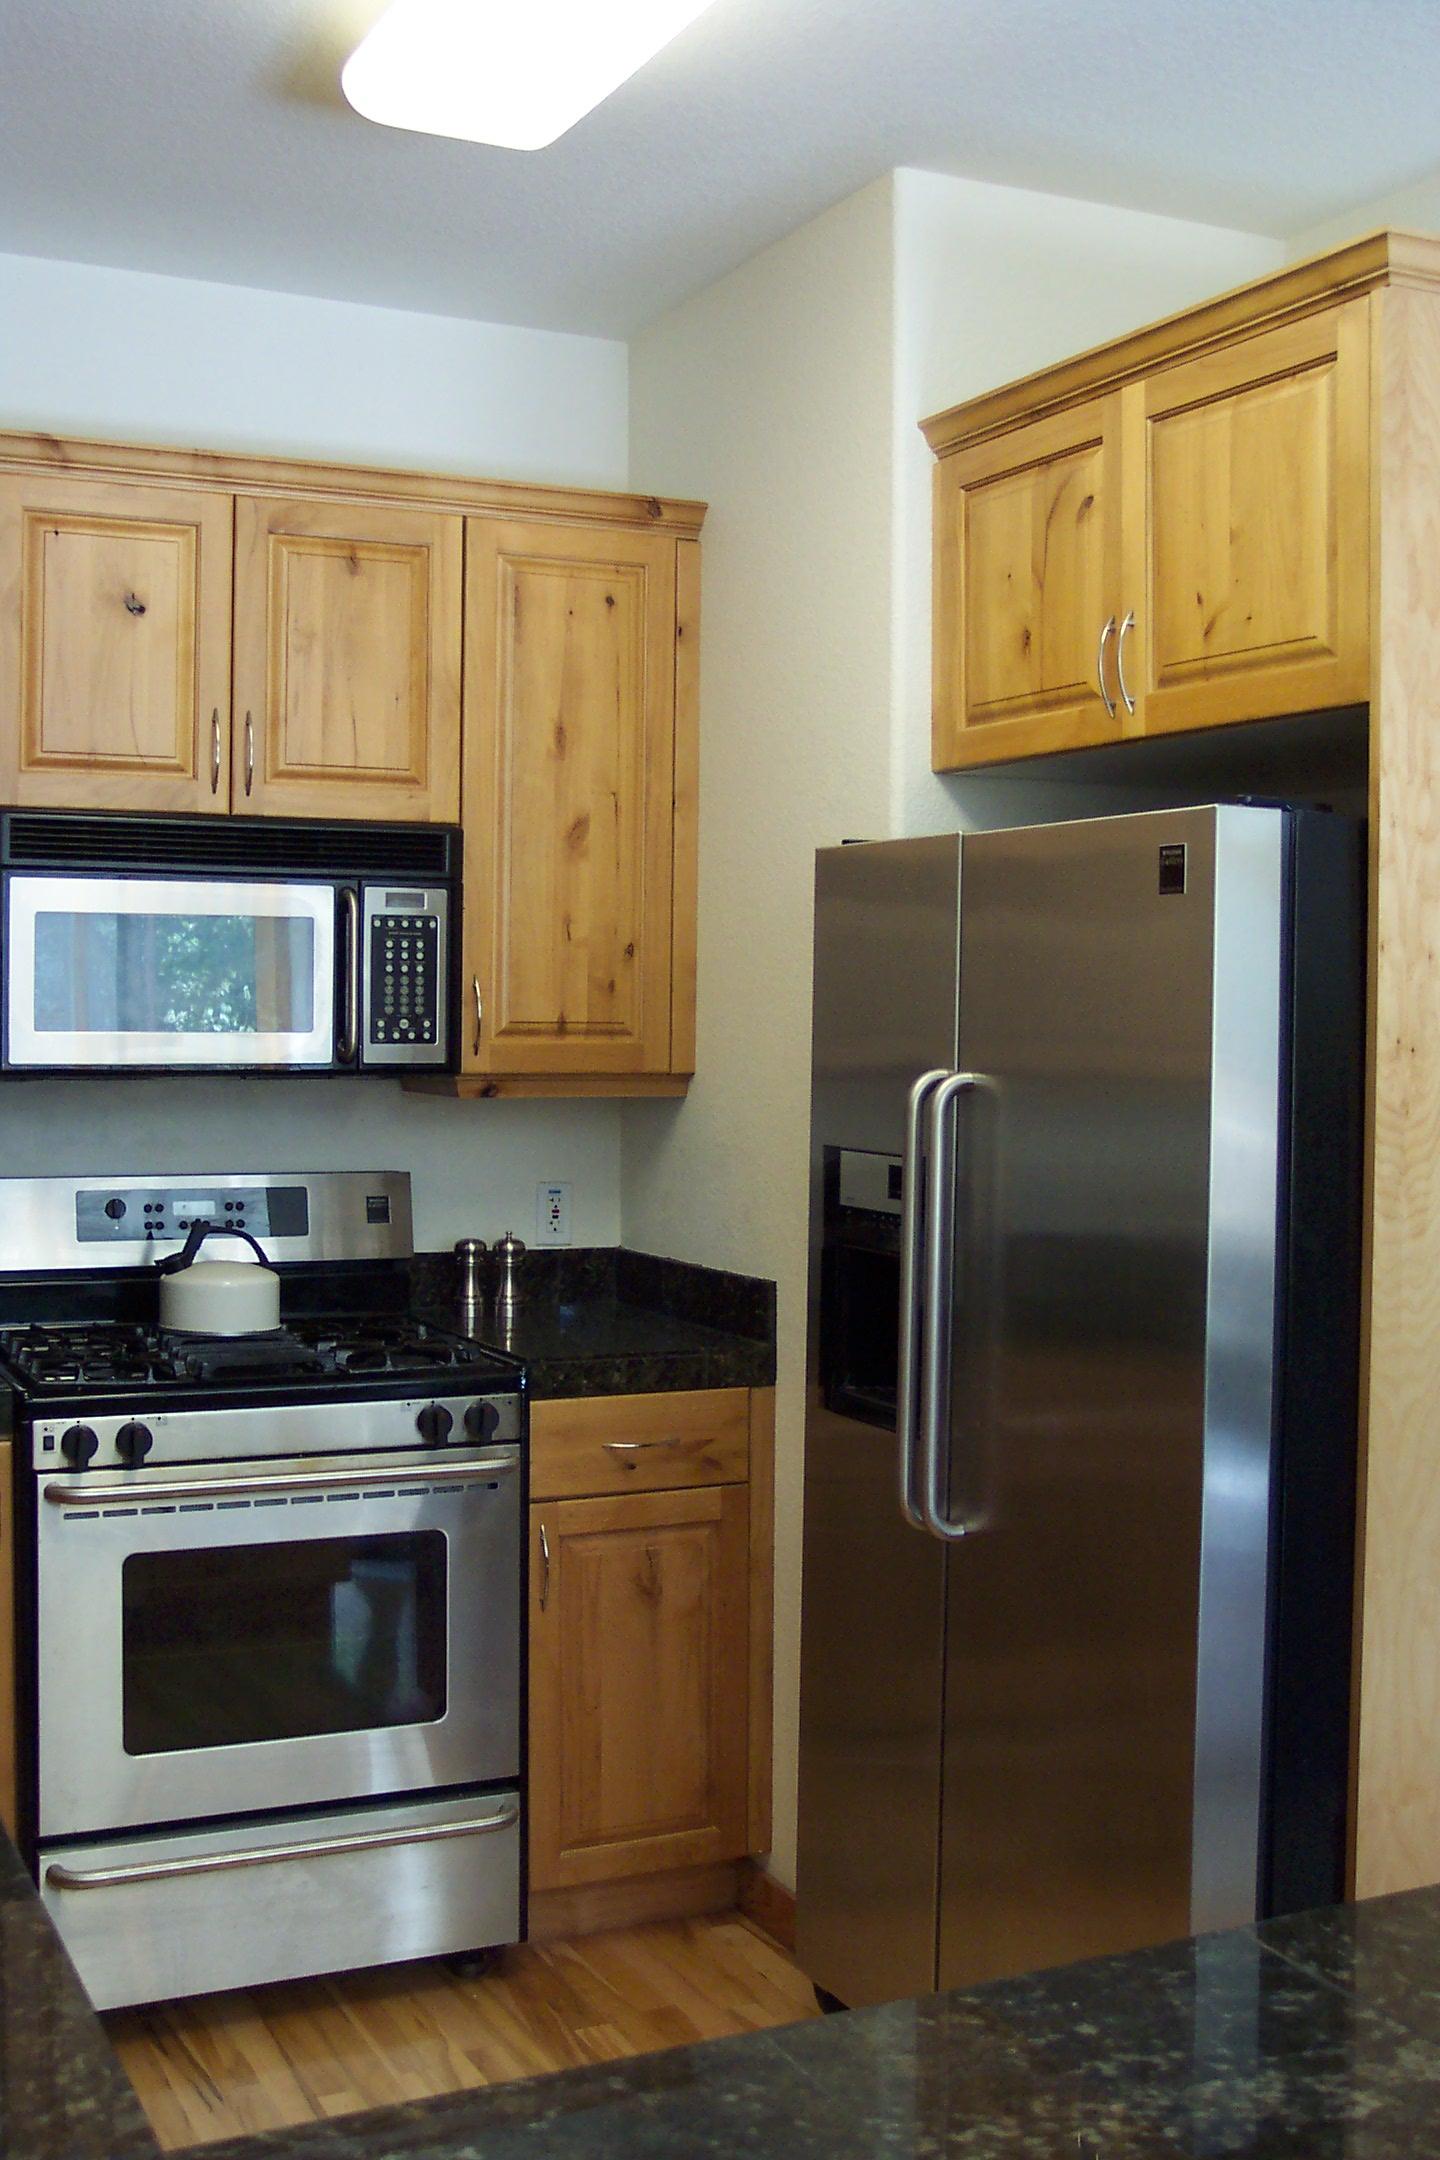 mobile home kitchen design kitchen remodel app Small Kitchen Design Ideas